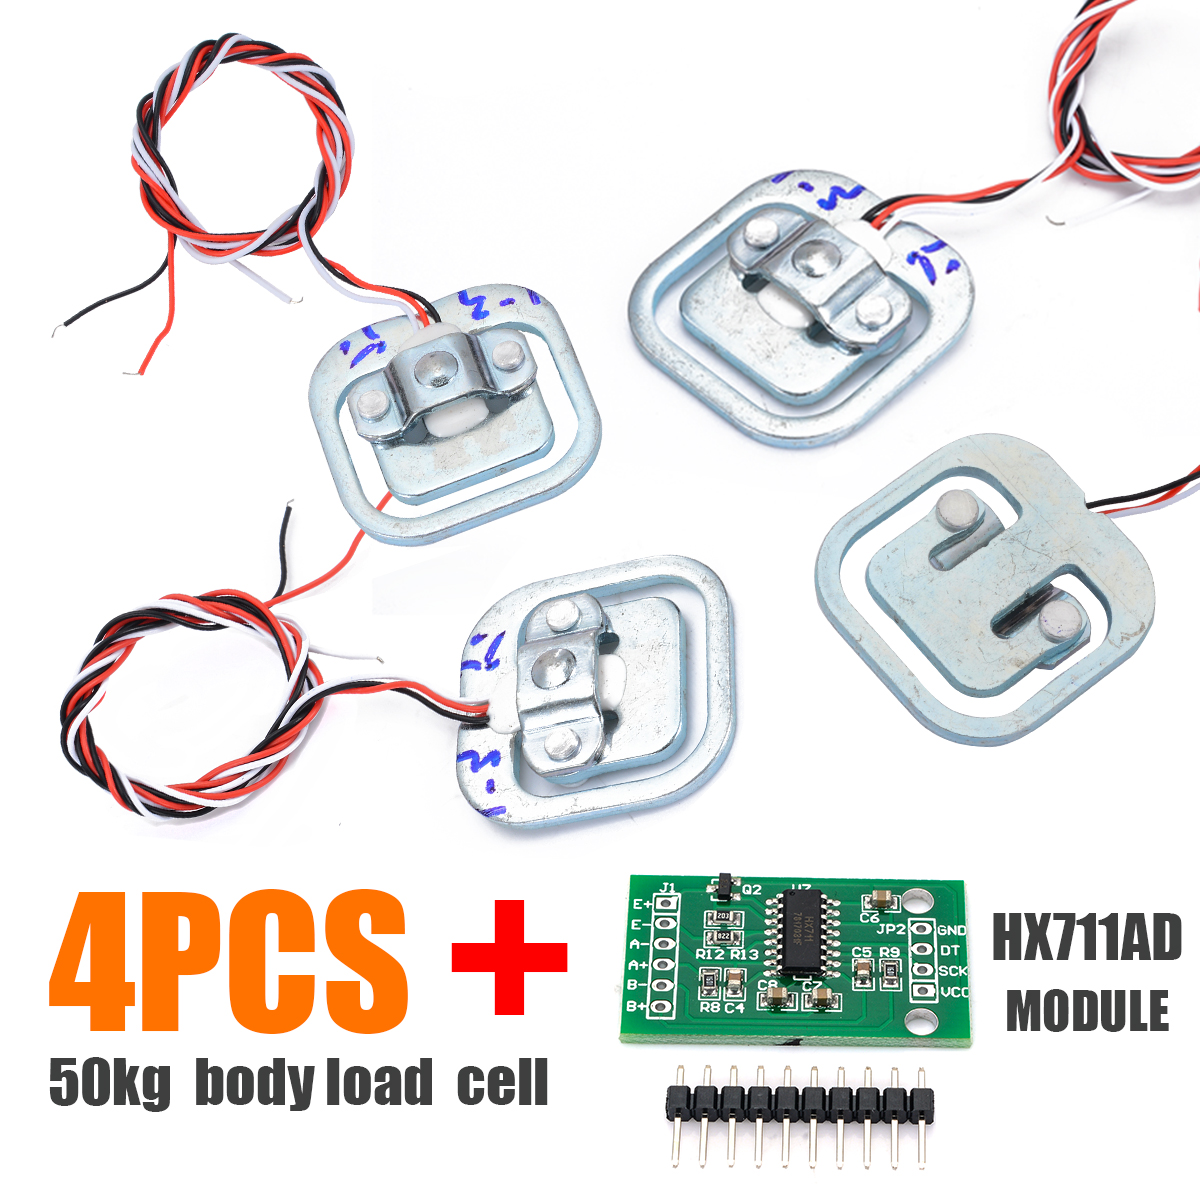 4pcs/set 50KG Human Scale Body Load Cell Resistance Strain Weight Sensor + HX711 AD Module Pressure Sensors Measurement Tools